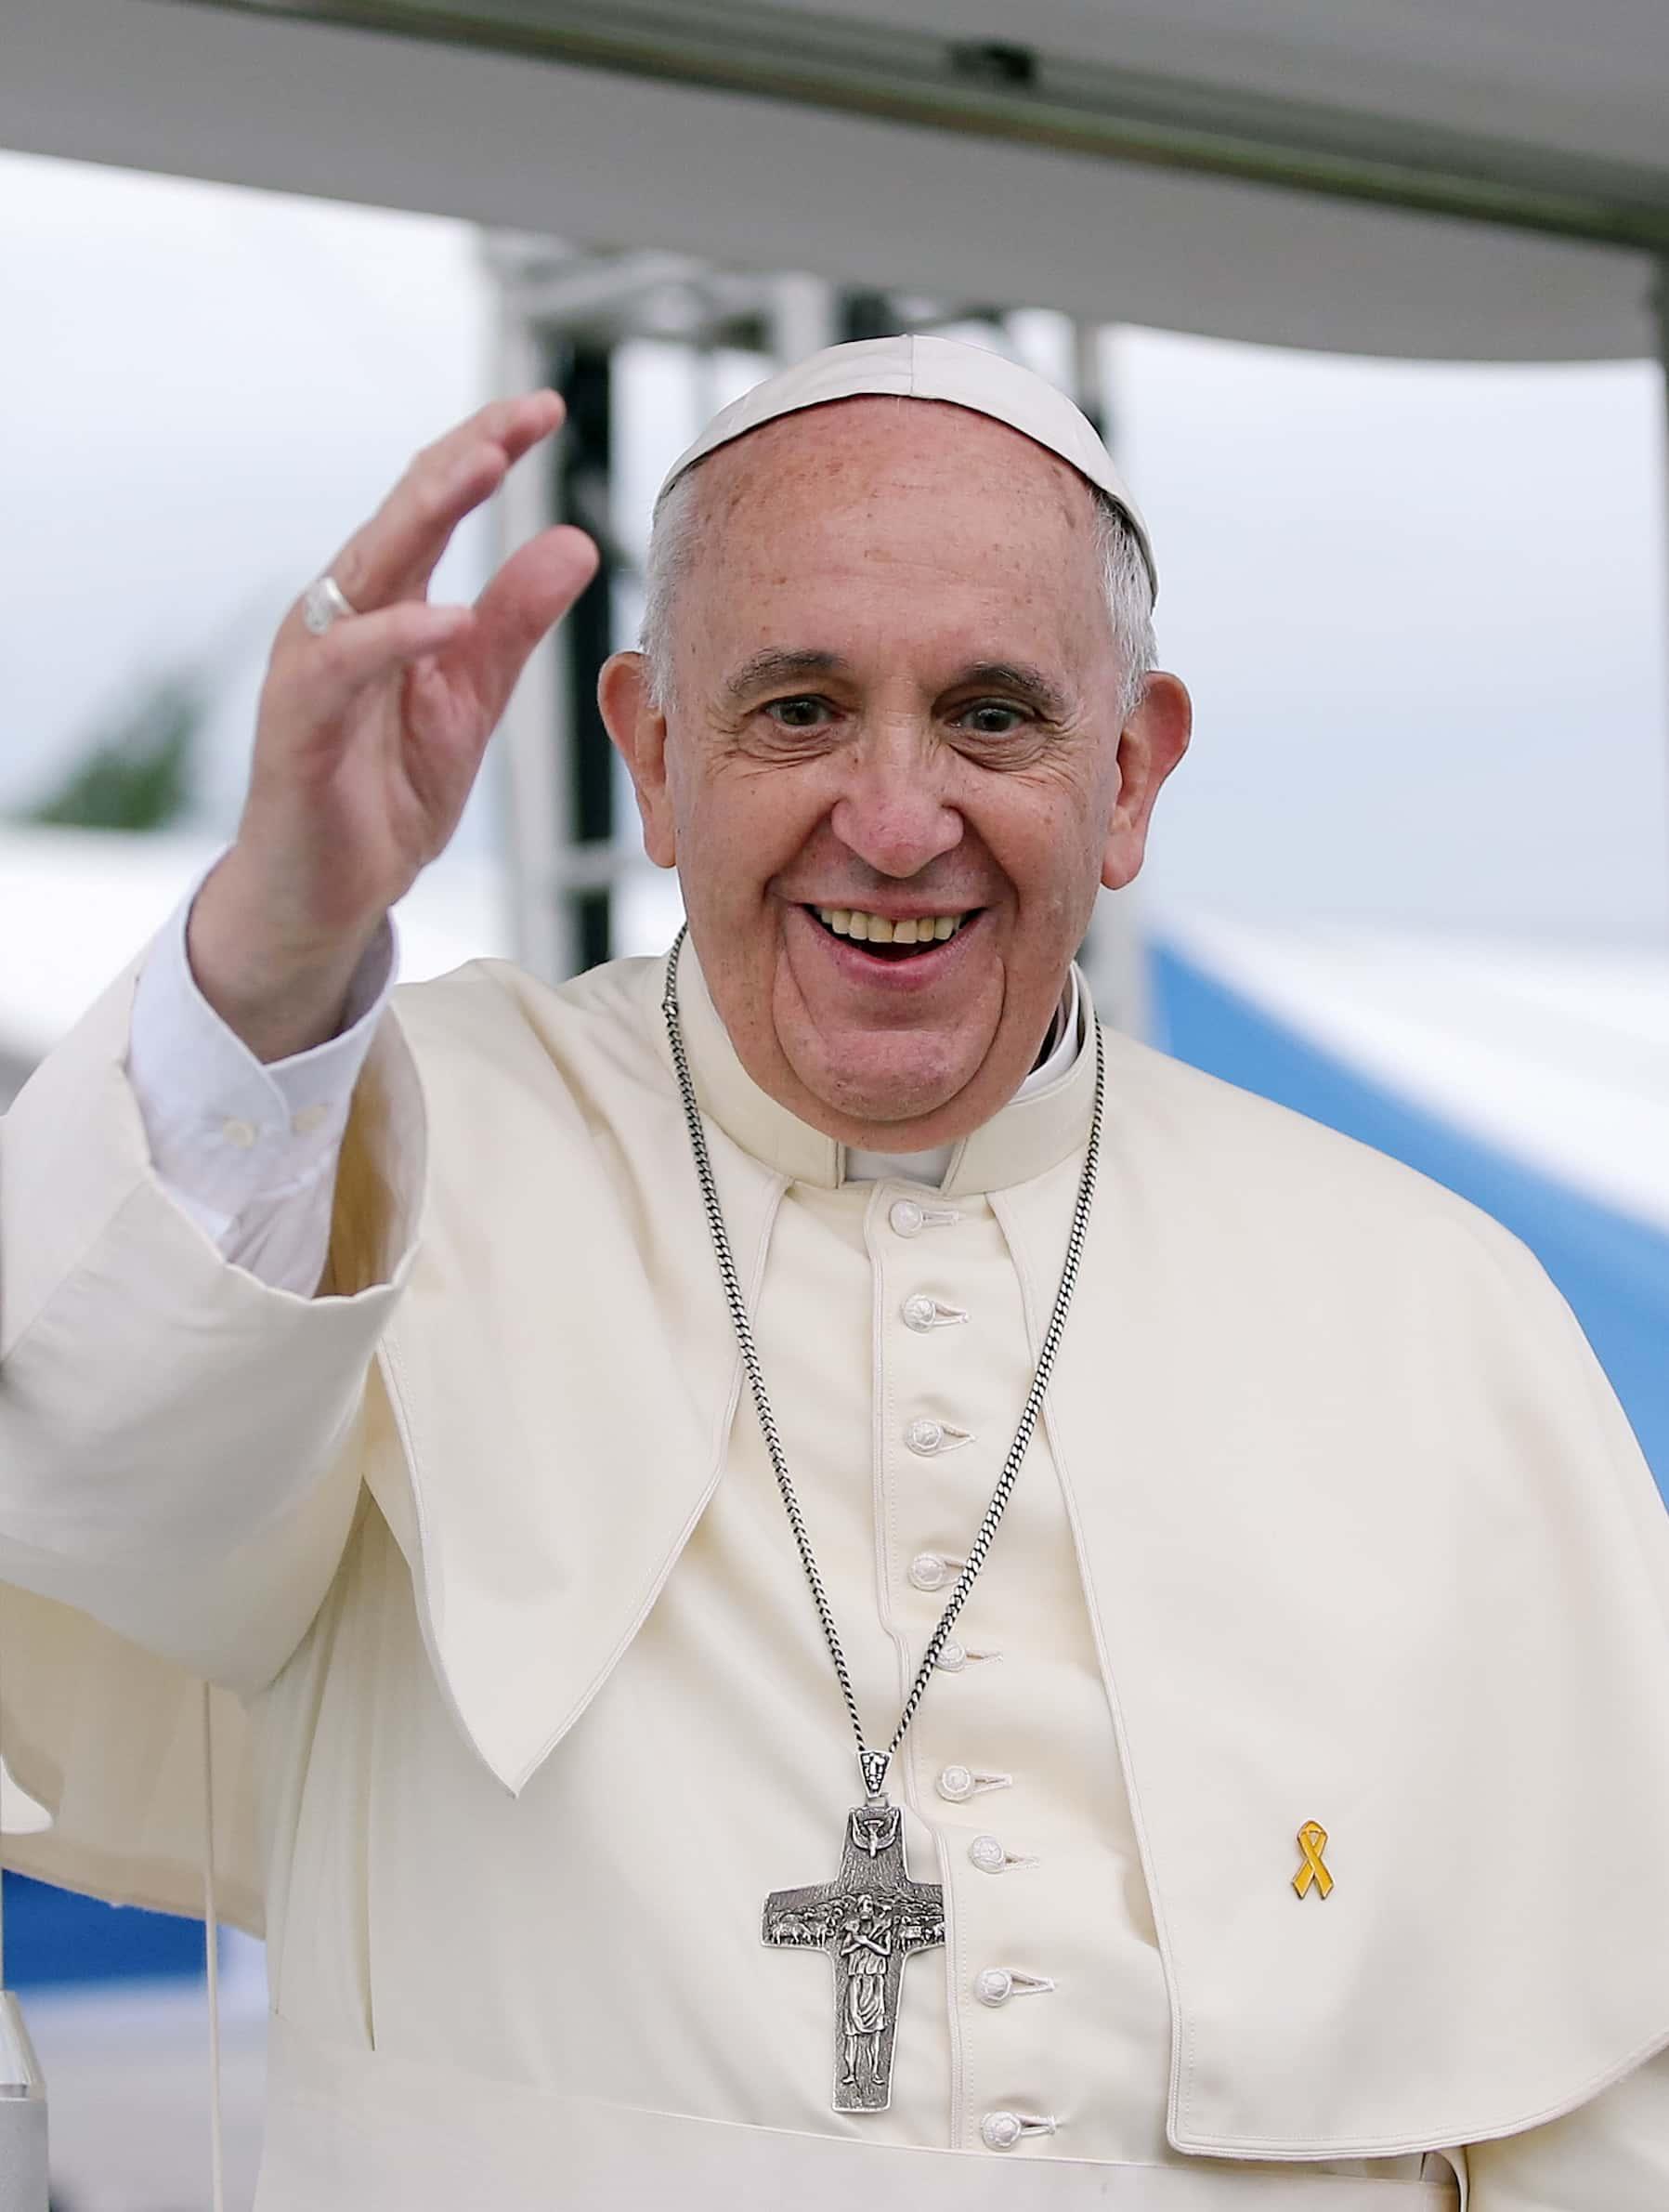 Pope Editorial